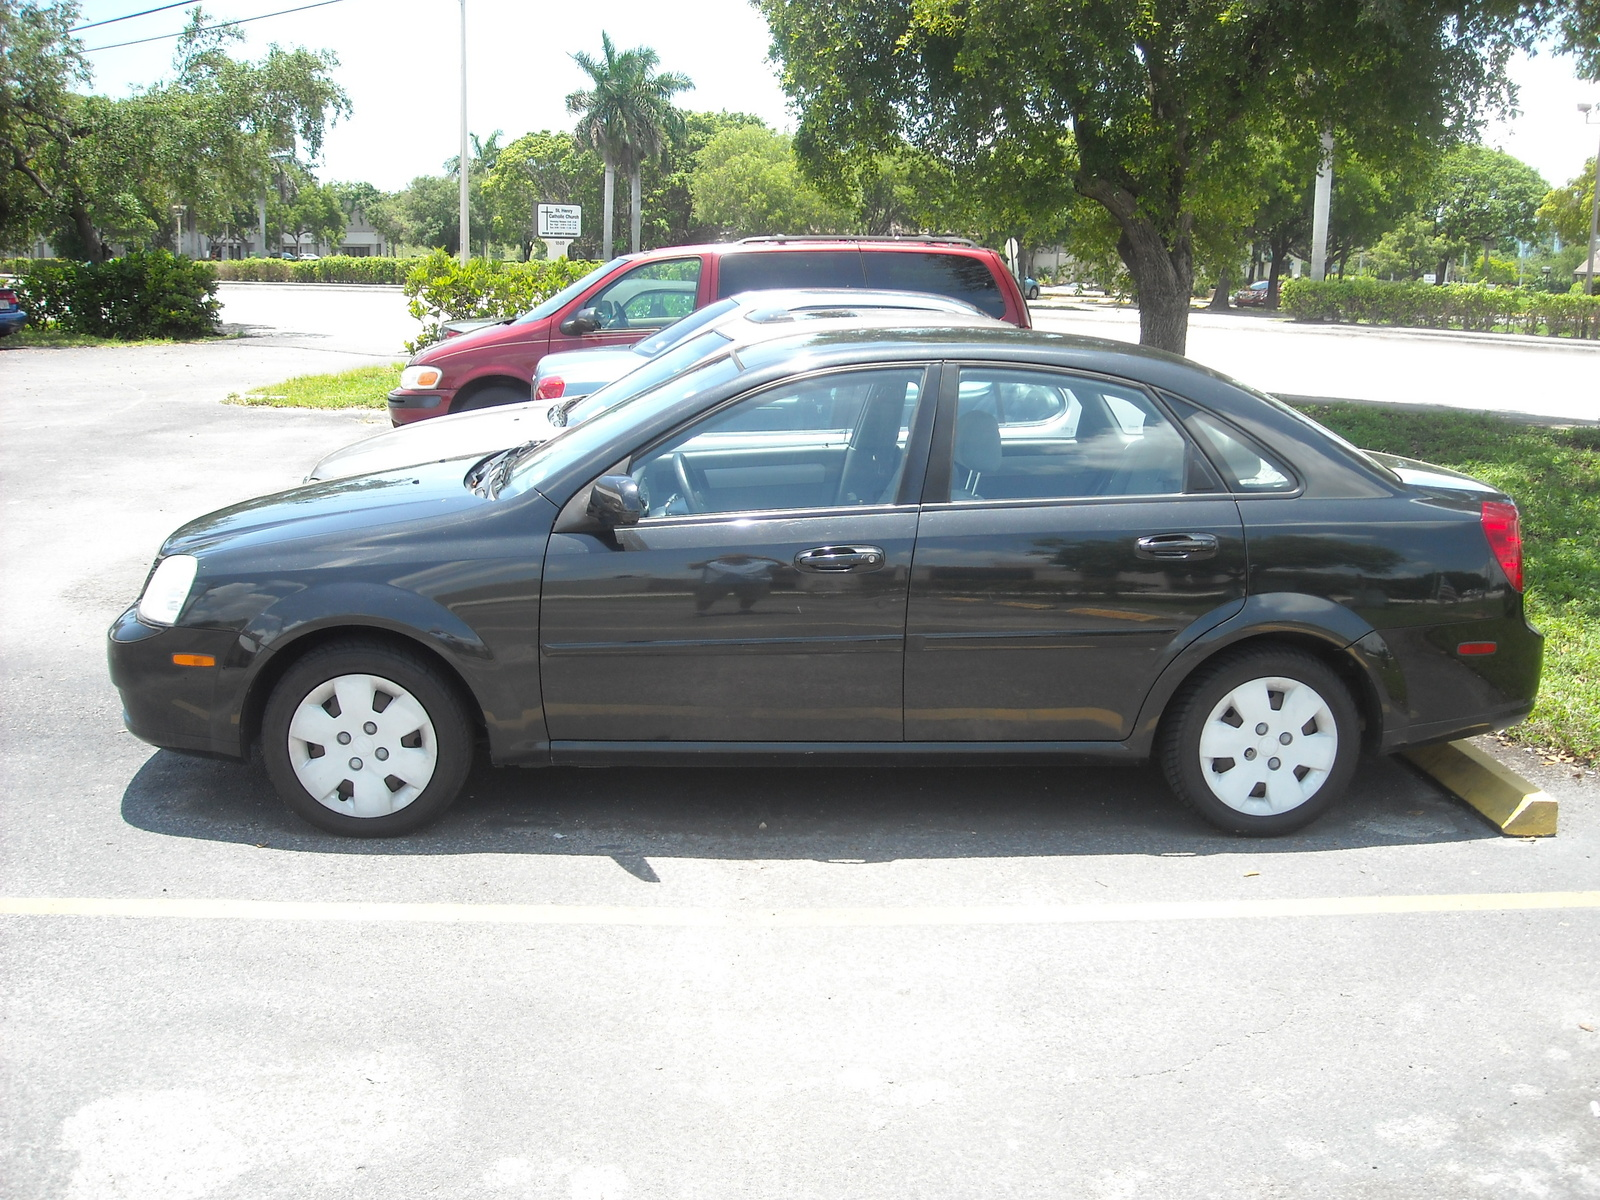 Picture of 2007 suzuki forenza sedan w abs exterior